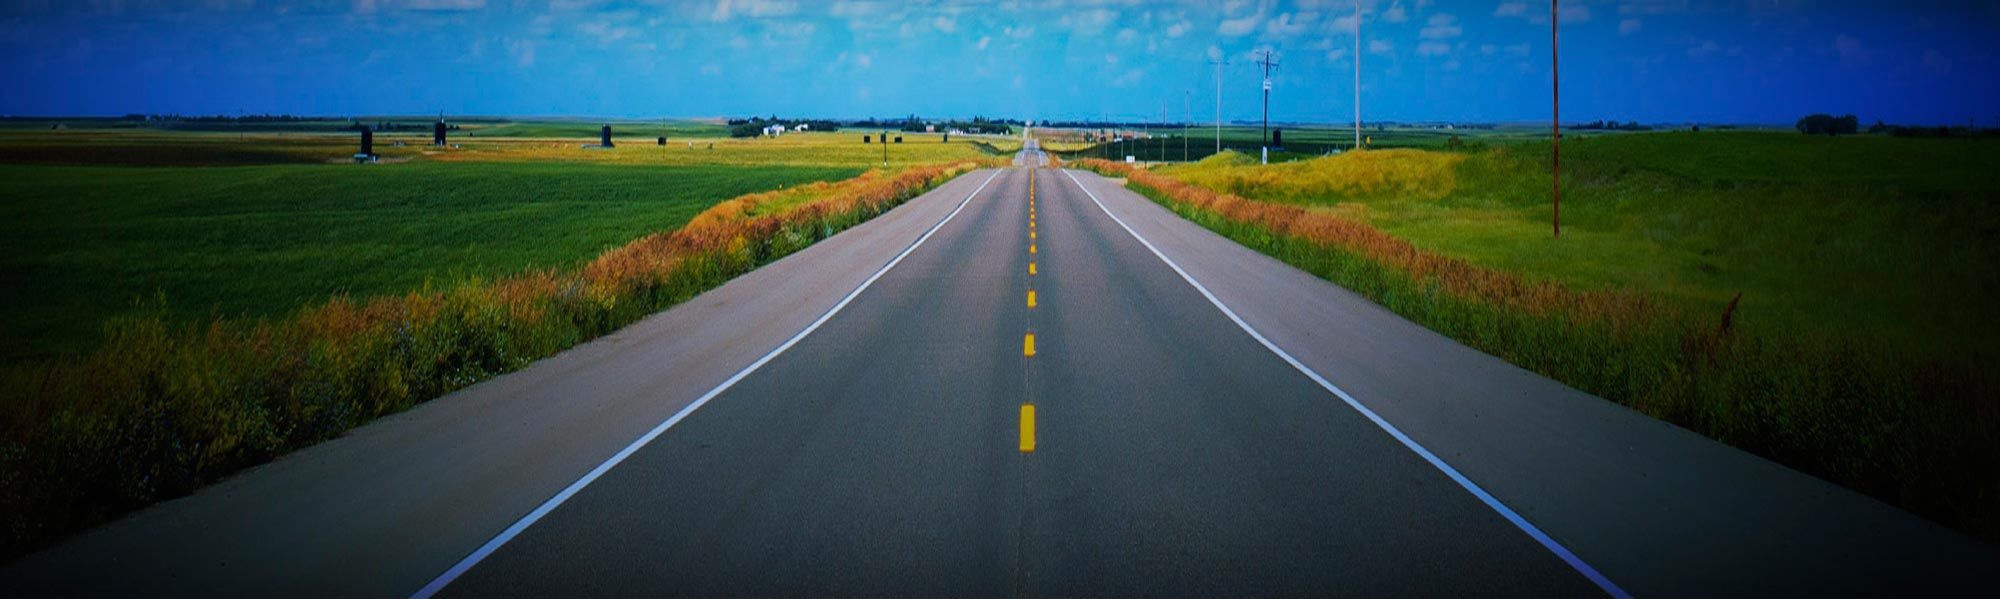 The most dangerous states for car accidents   Autos   journalstar com